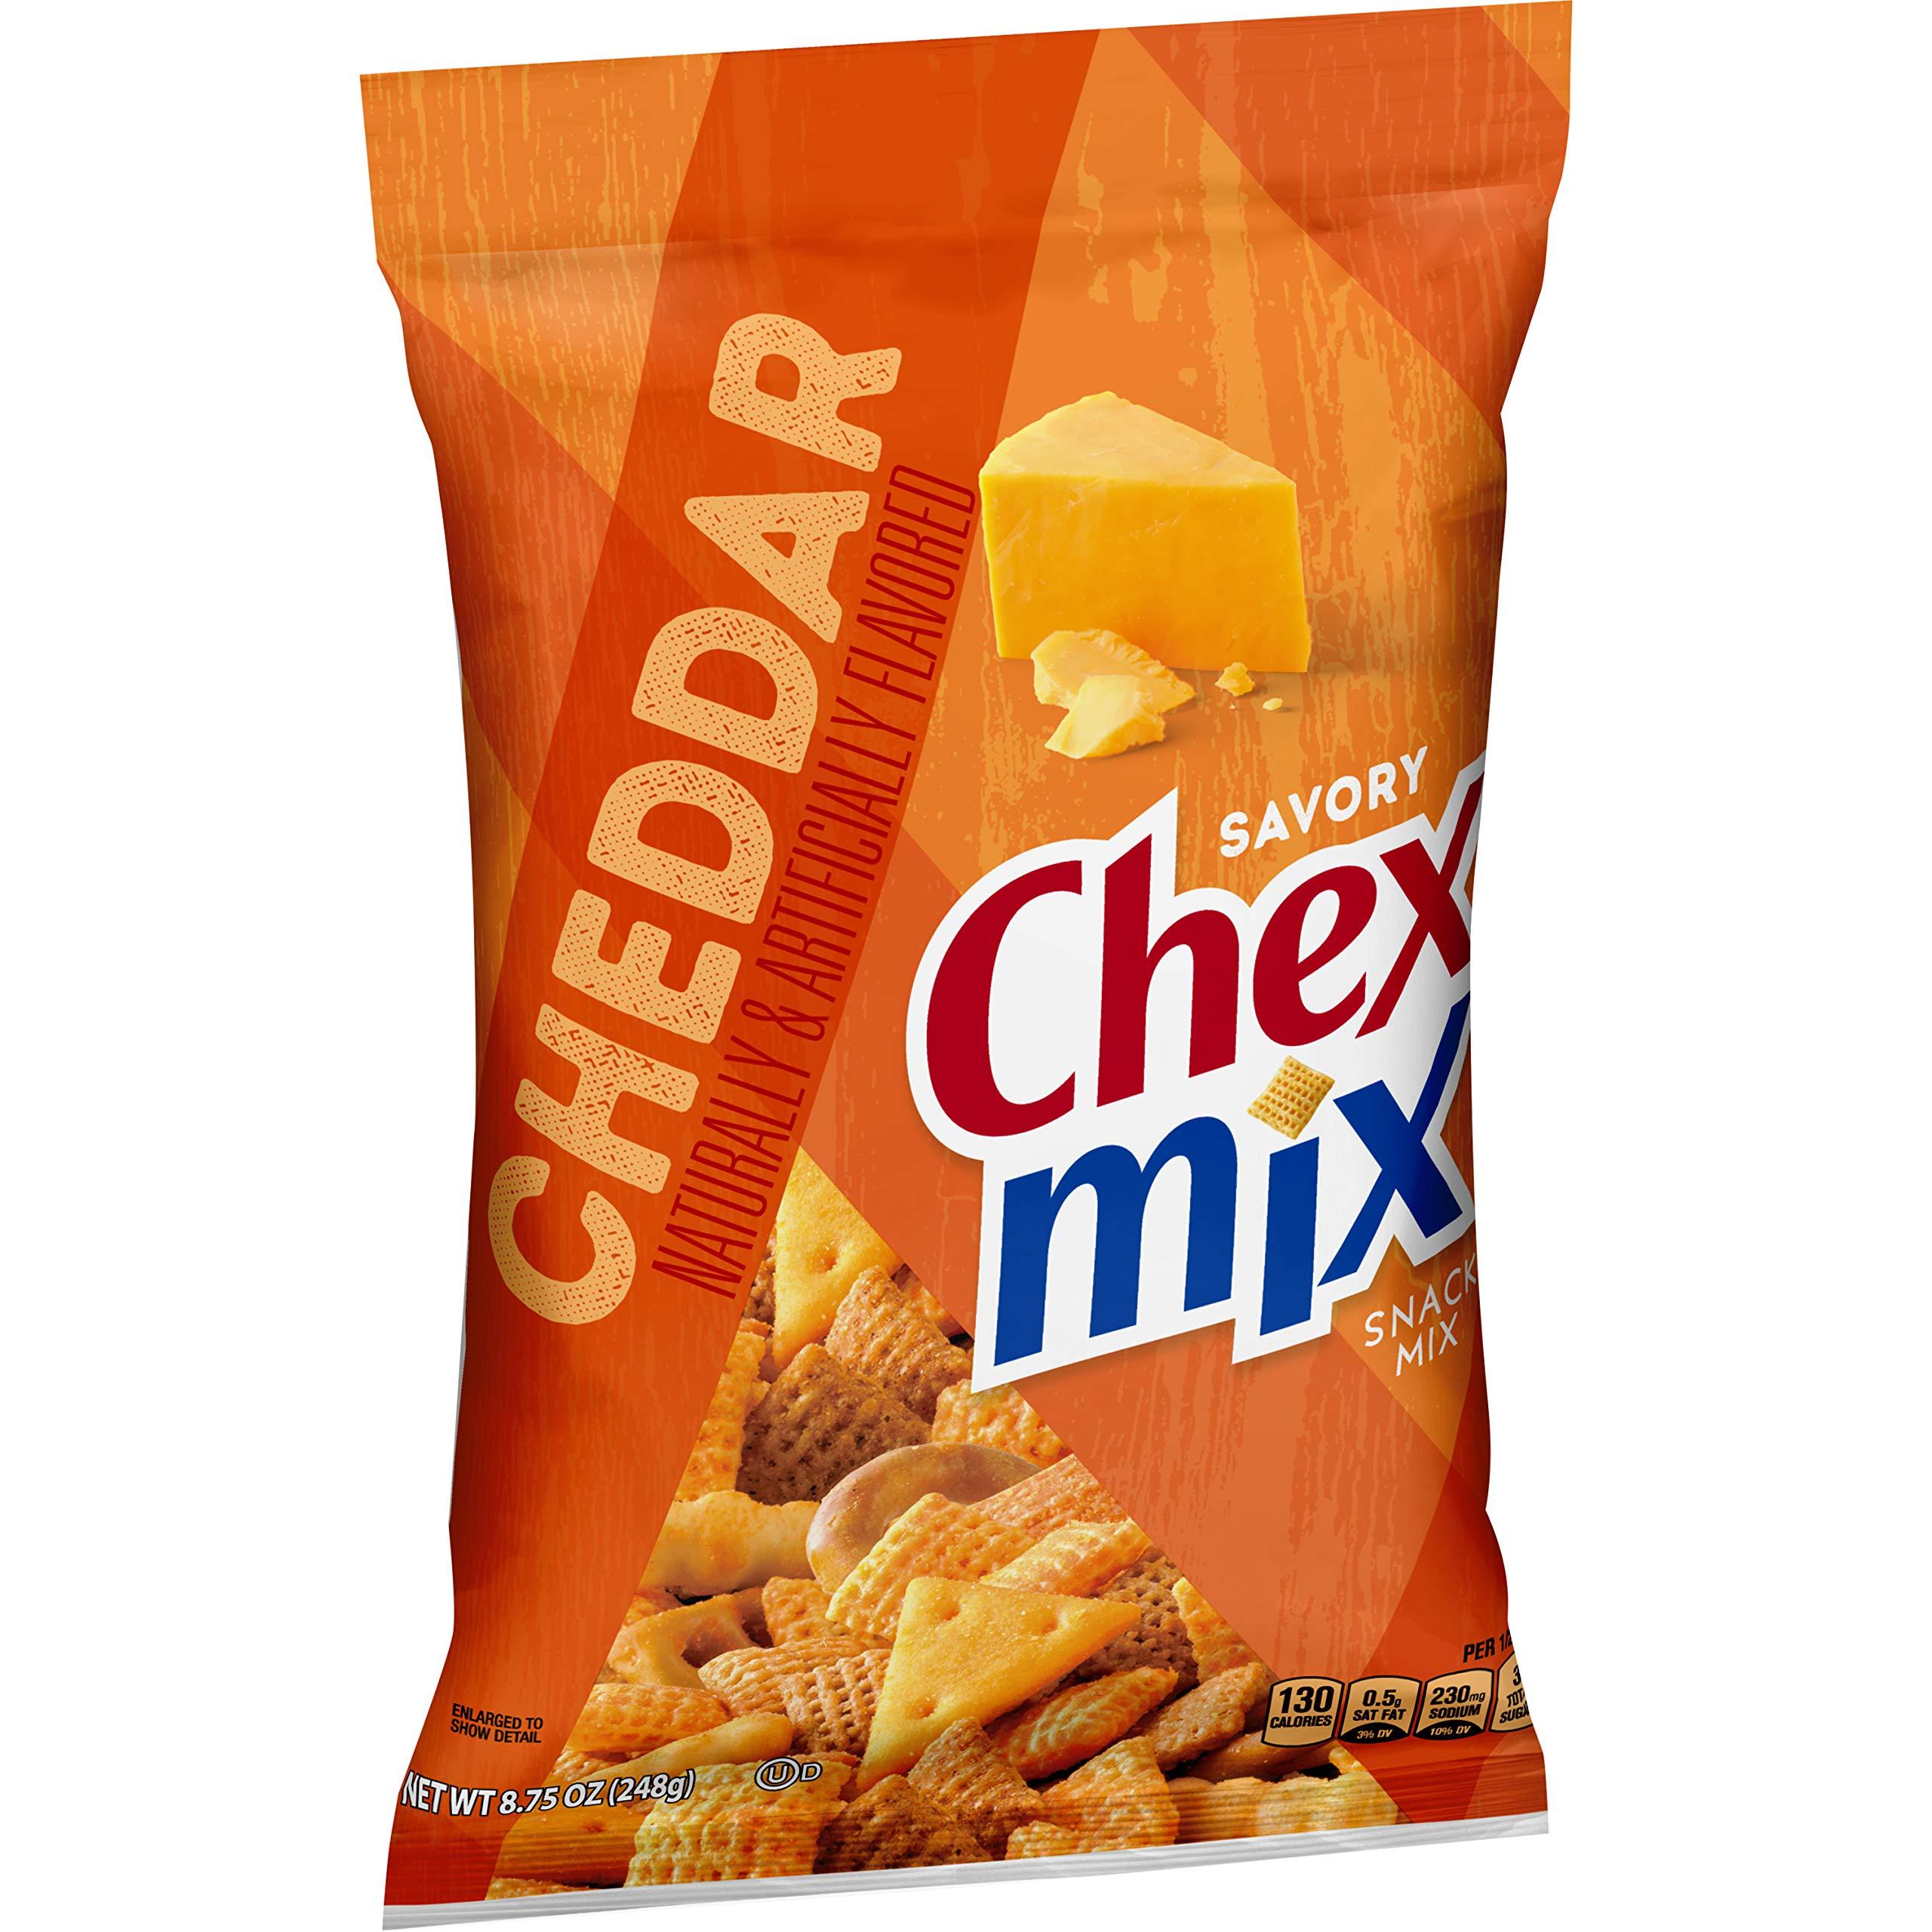 Chex Mix, Snack Mix, Savory Cheddar, 8.75 oz. Bag